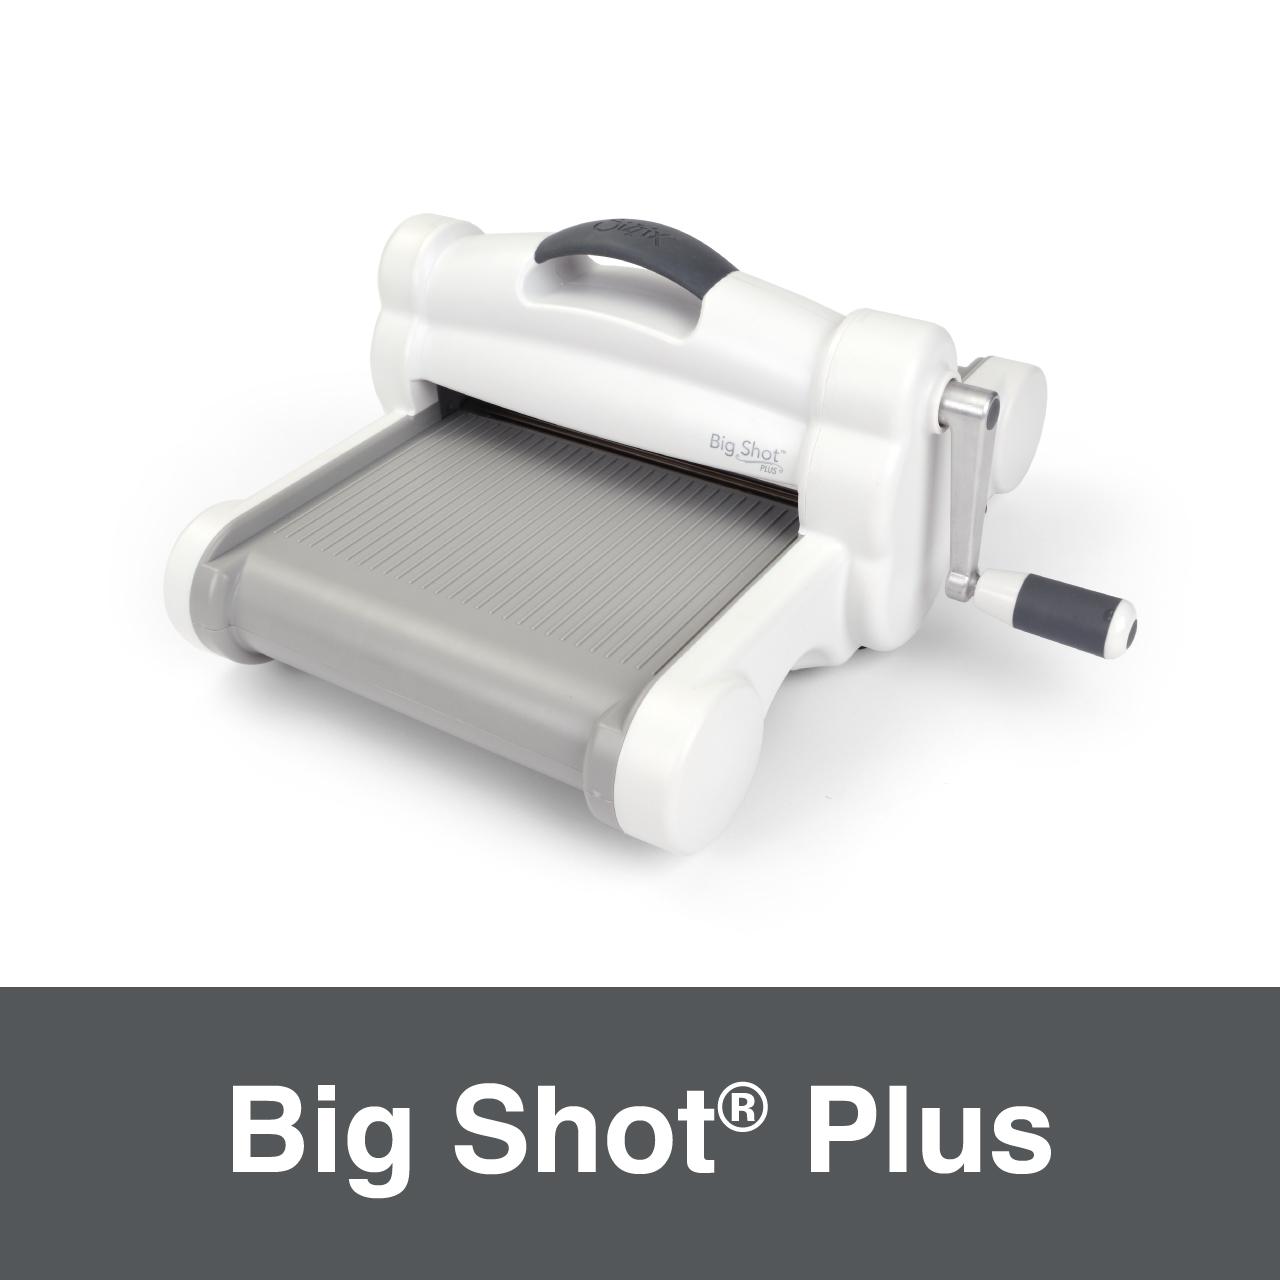 Big Shot Plus